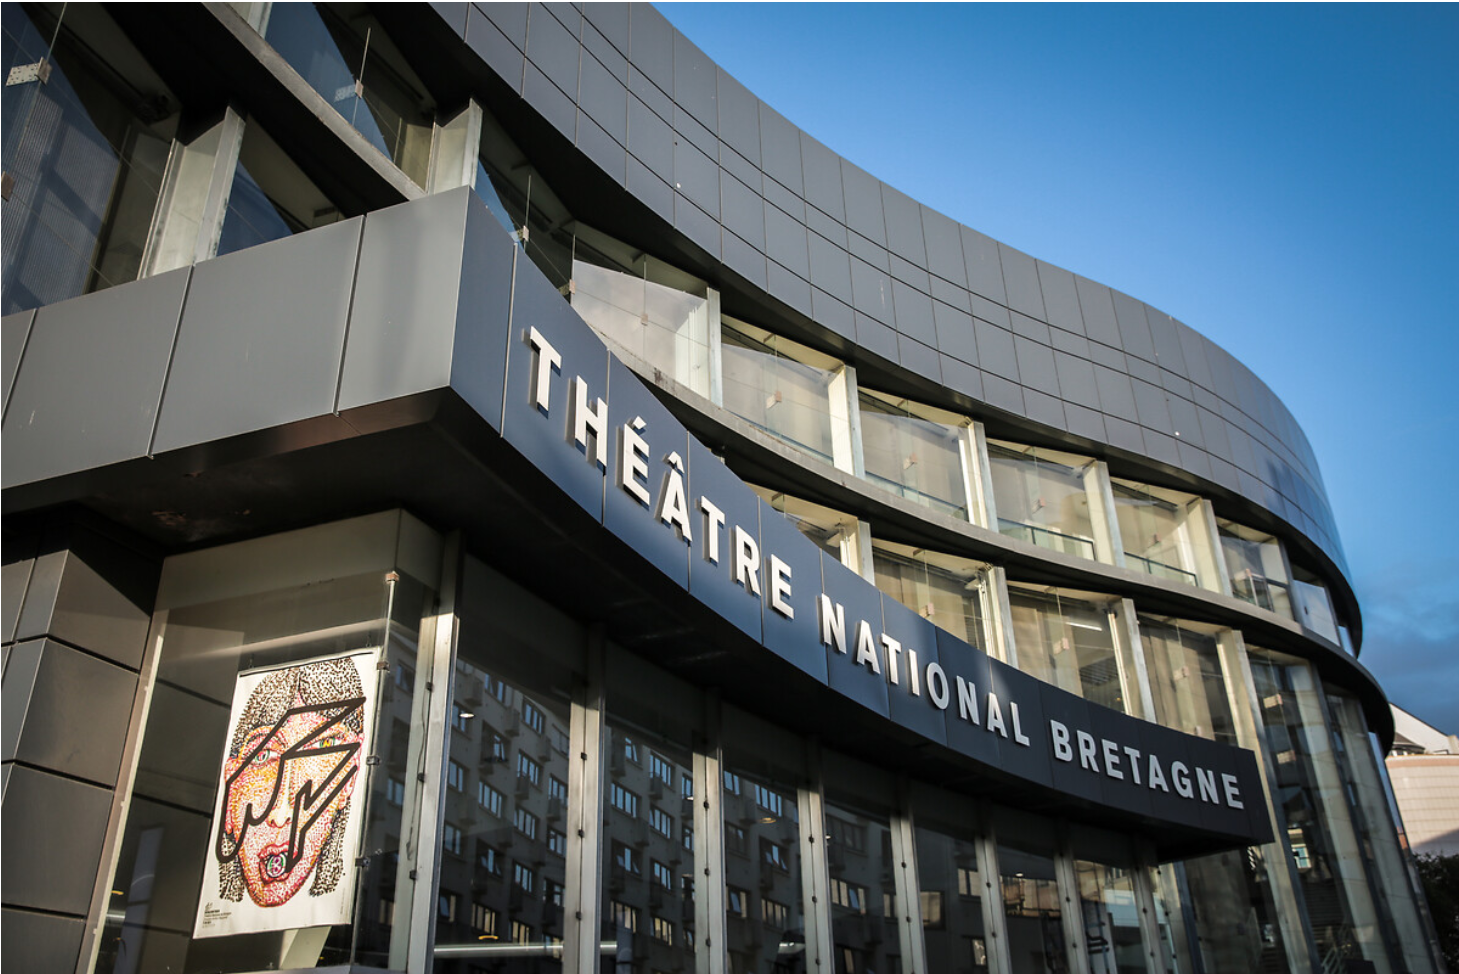 Façade du Théâtre National de Bretagne